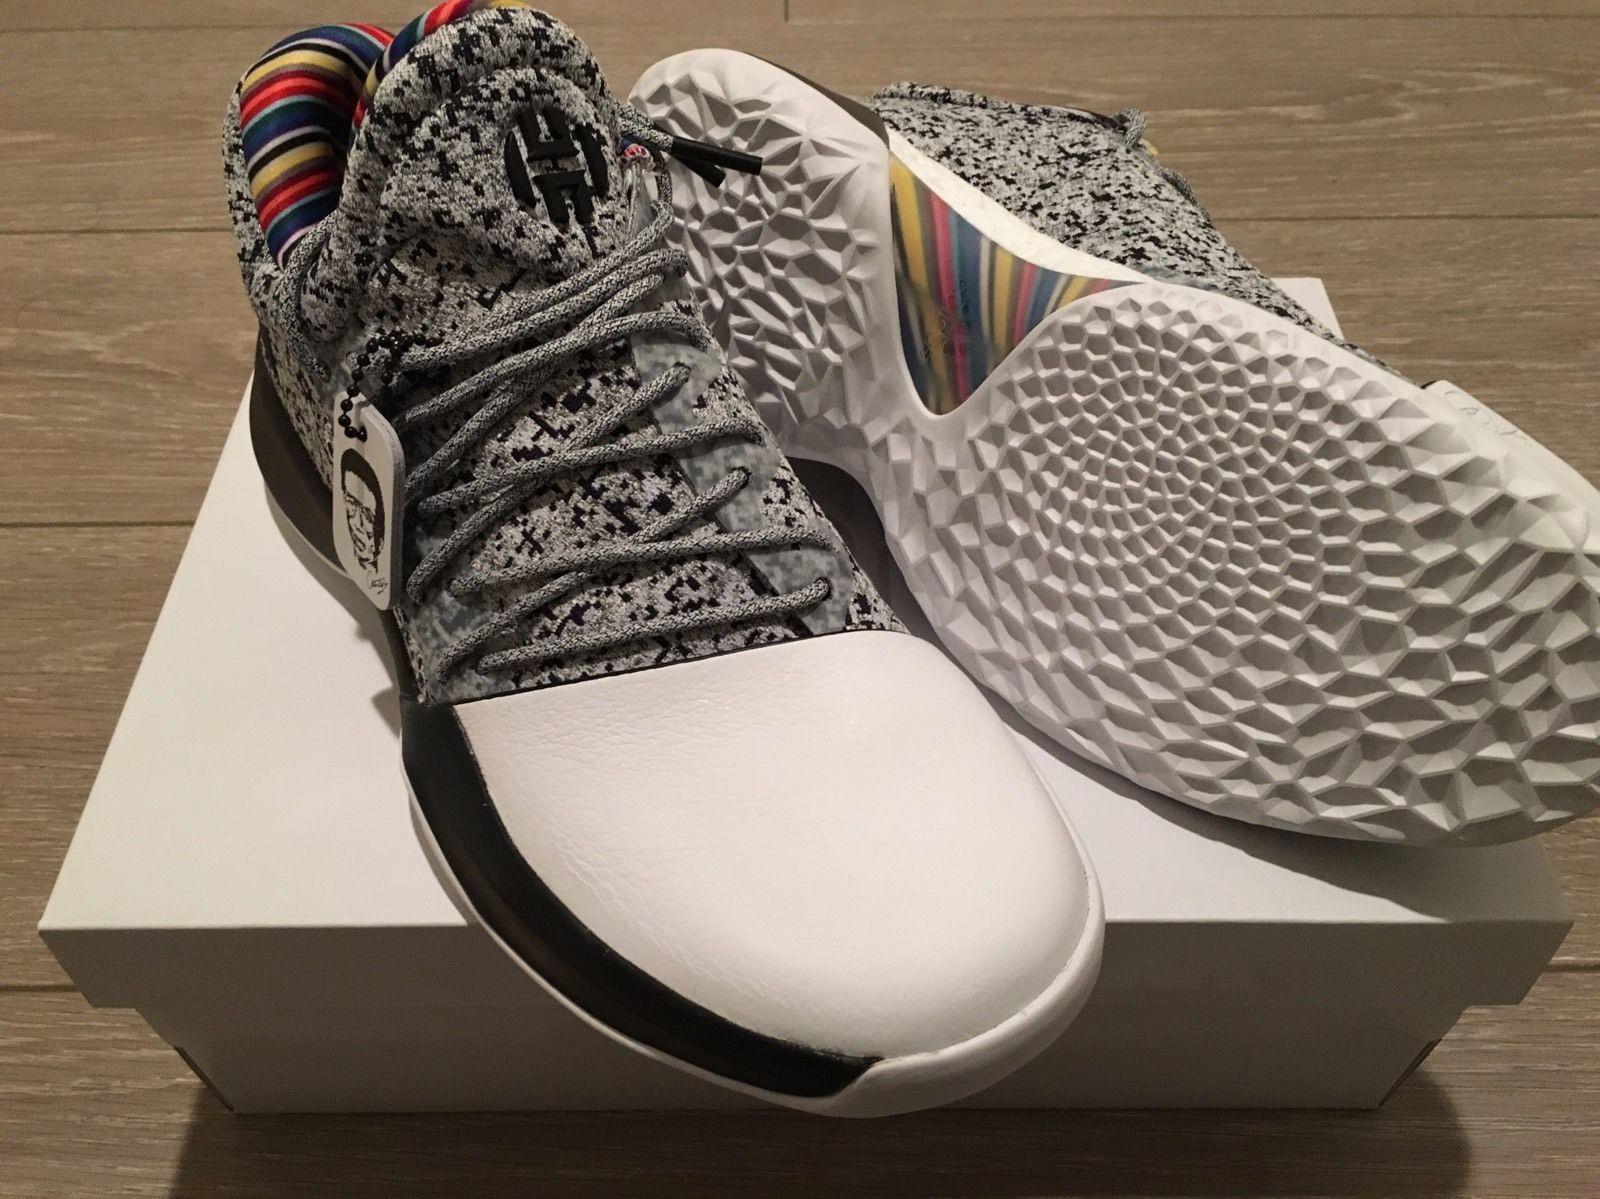 Adidas 2017 Harden 1 Shoes James Harden Vol. 1 BHM Arthur Ashe ... b387513cc